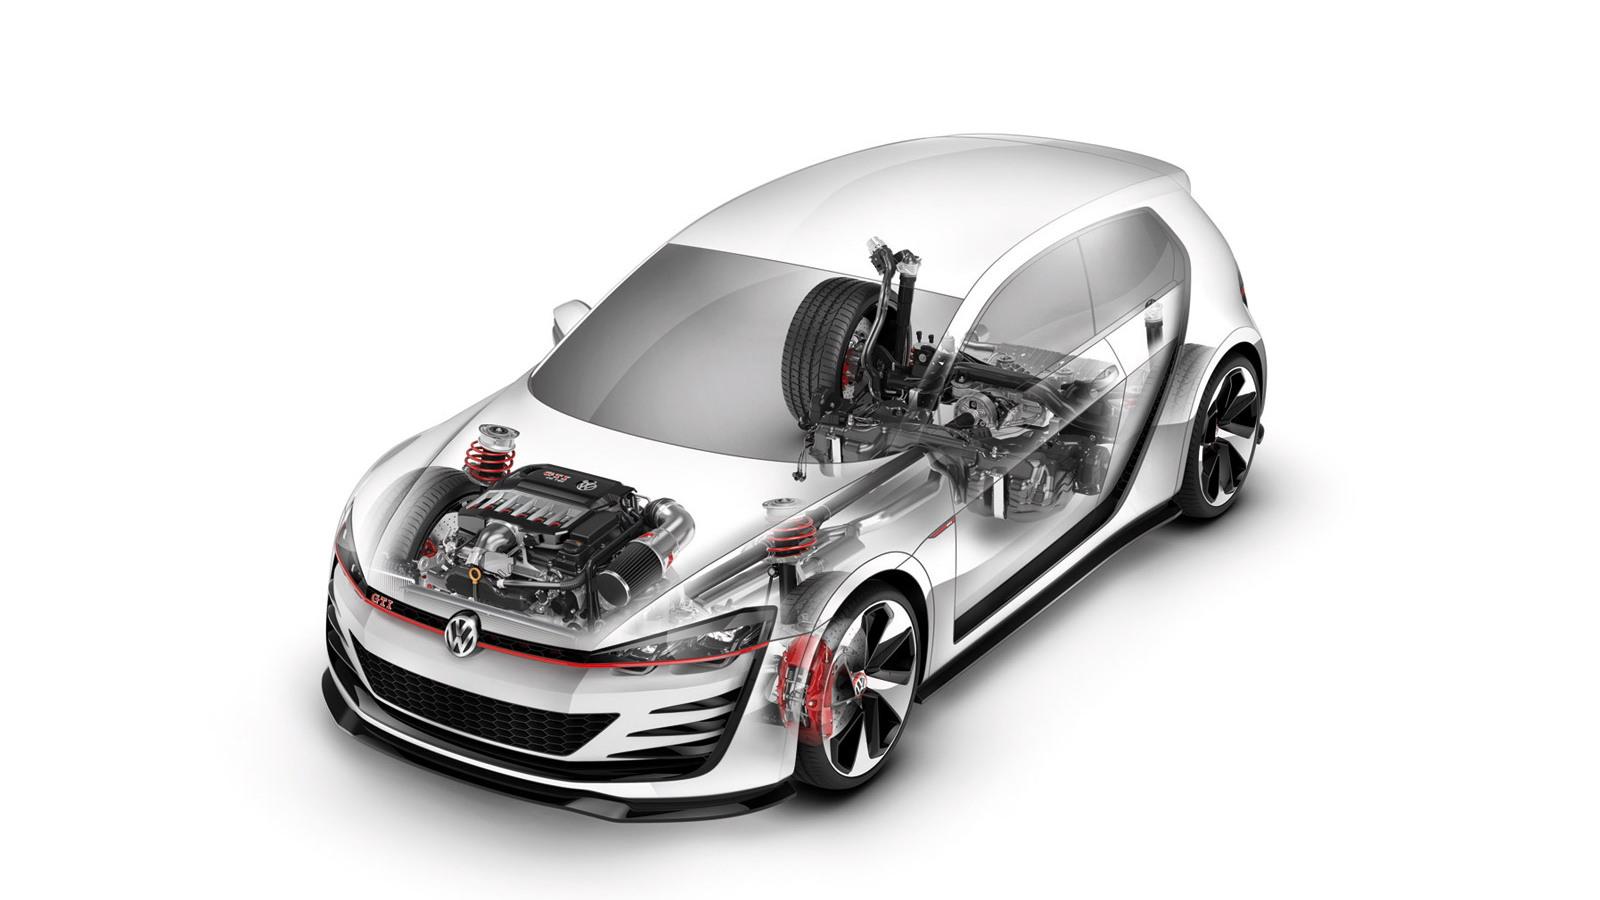 Volkswagen Design Vision GTI racing concept